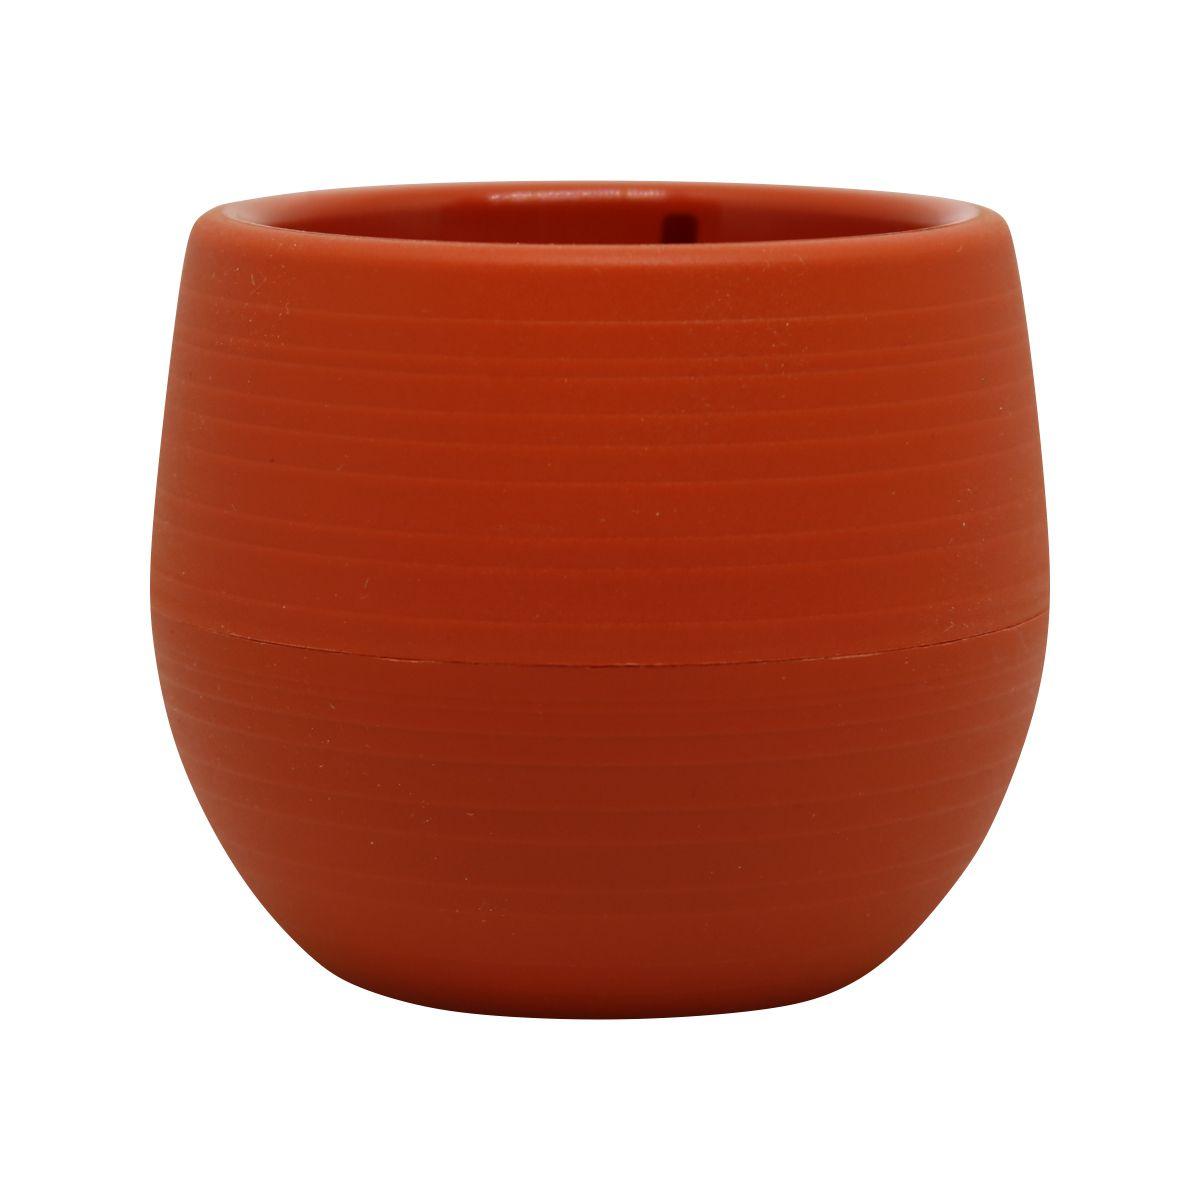 Vaso Babyball cor Cerâmica 7cm x 7cm